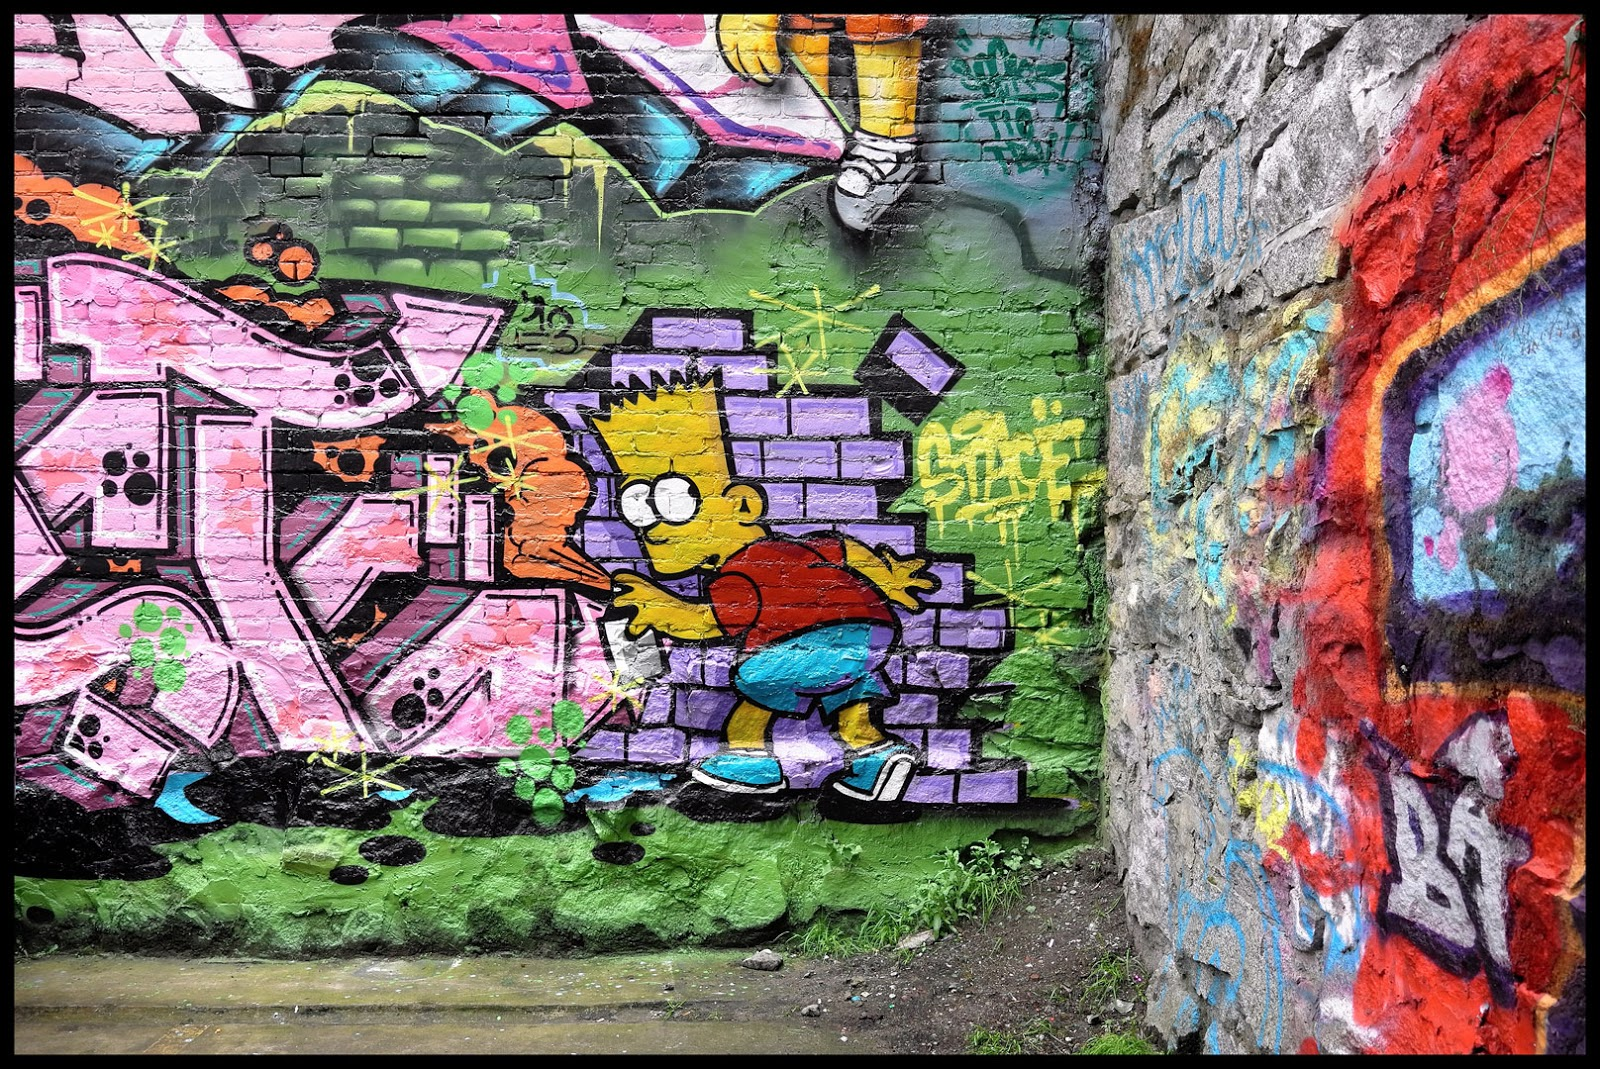 Is Bart Simpson A Working Graffiti Writer